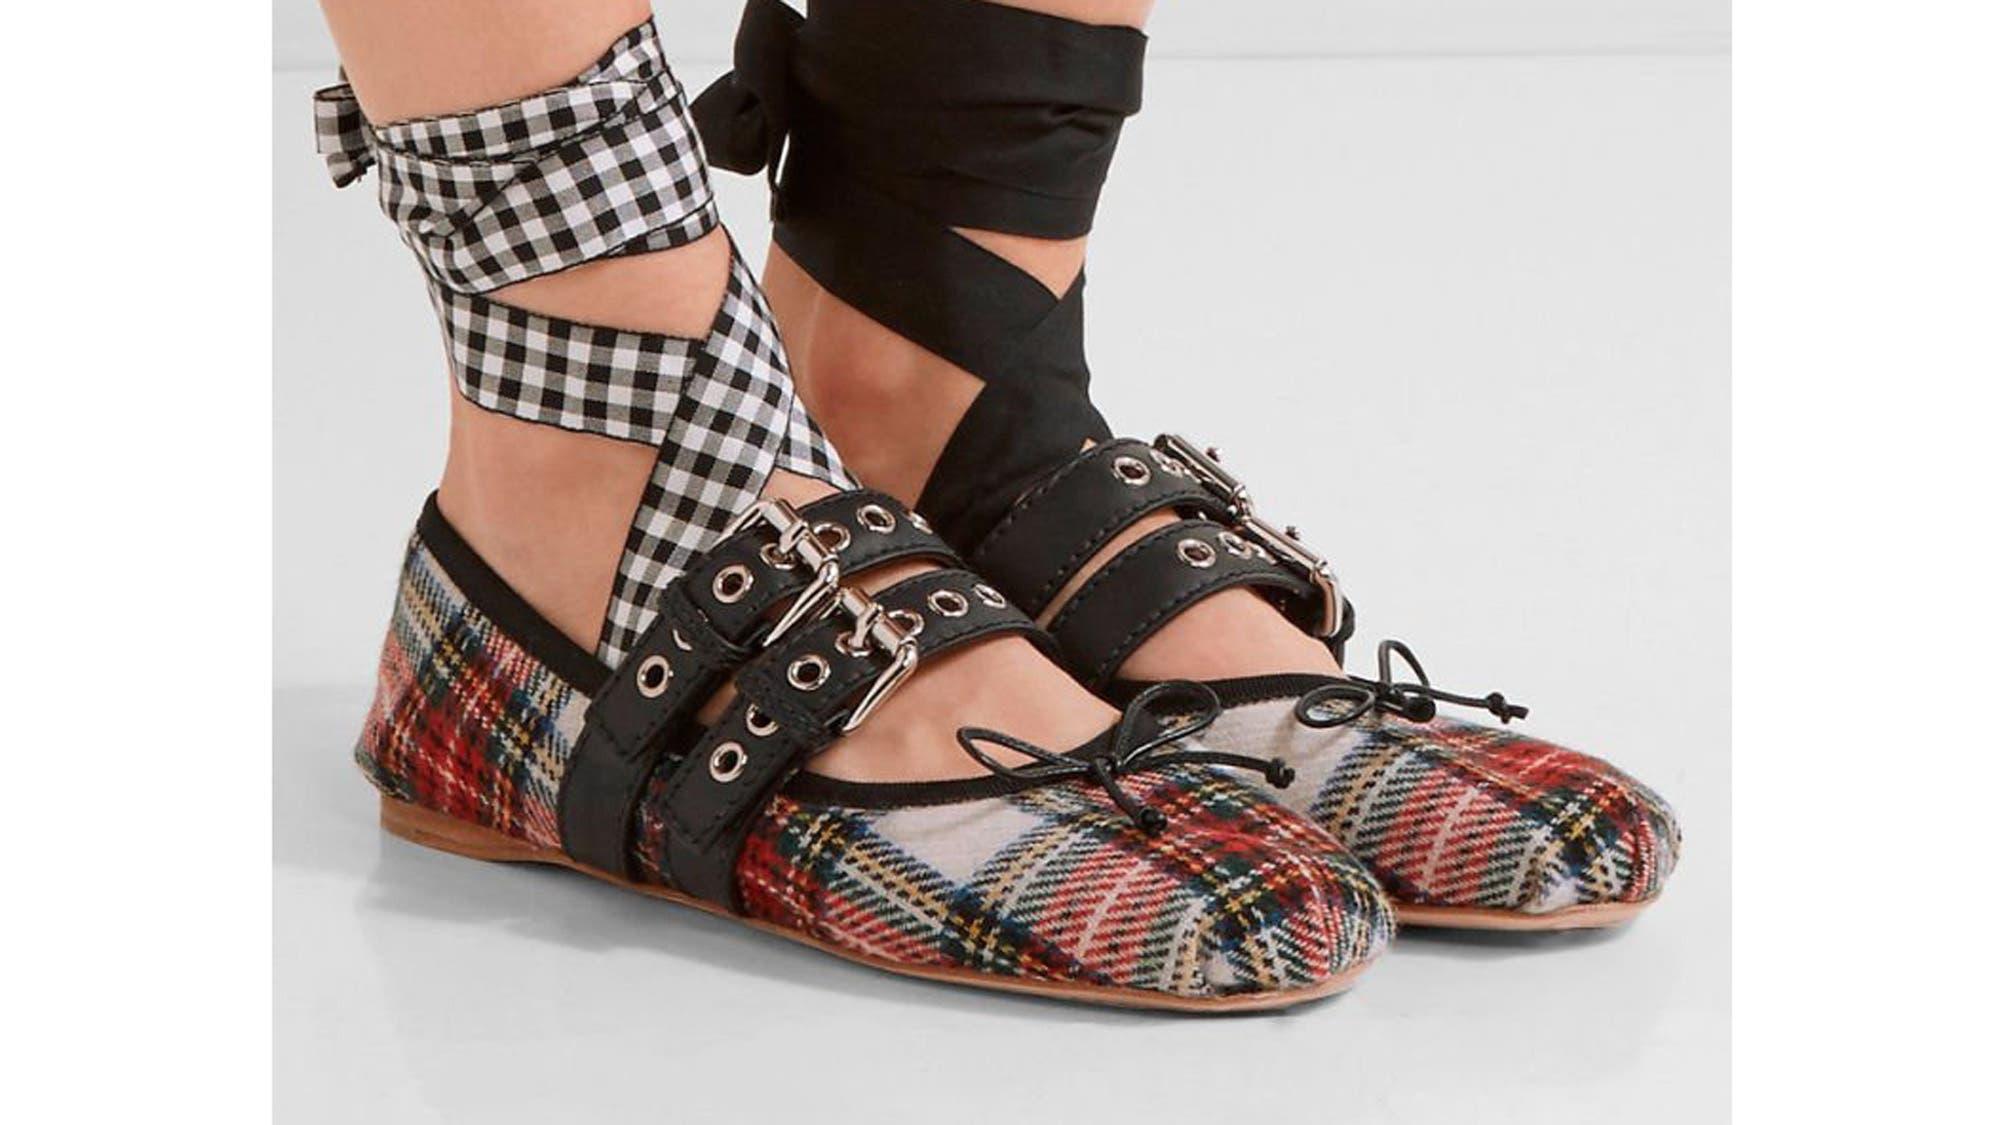 b8da01a26 Pares desparejos  está de moda usar un zapato diferente en cada pie - LA  NACION